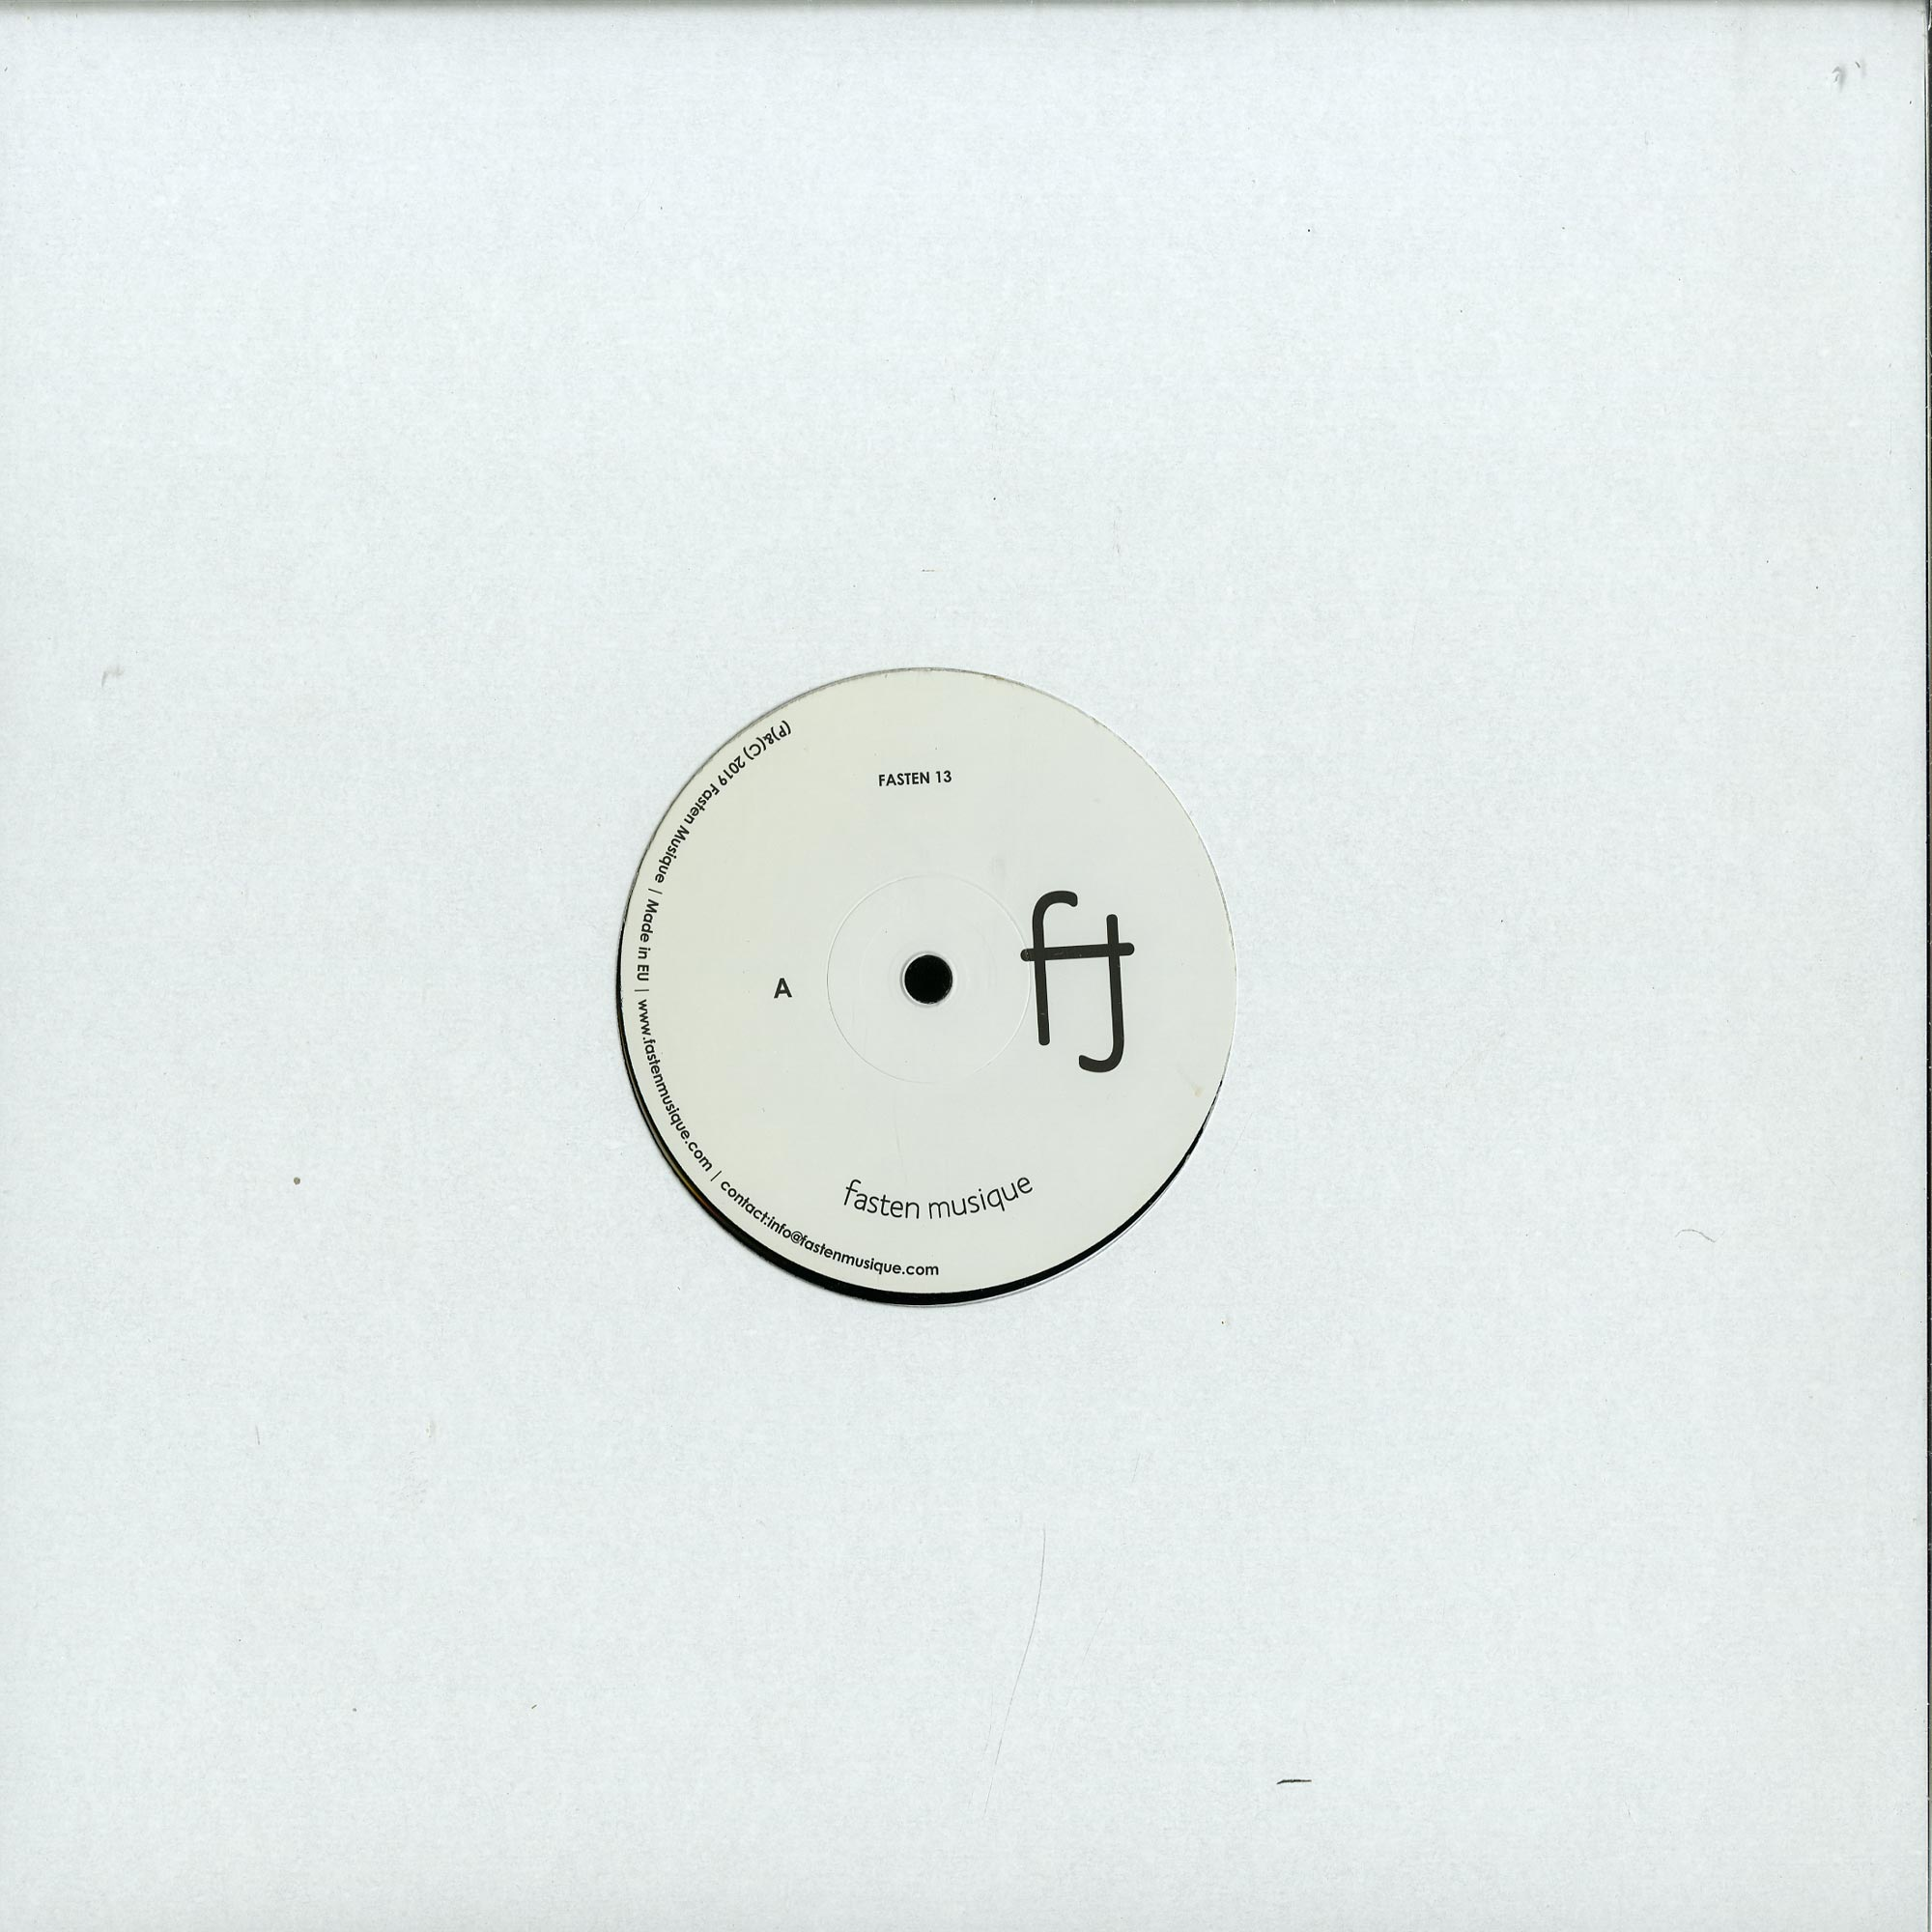 Kozac - HOODLOVE EP